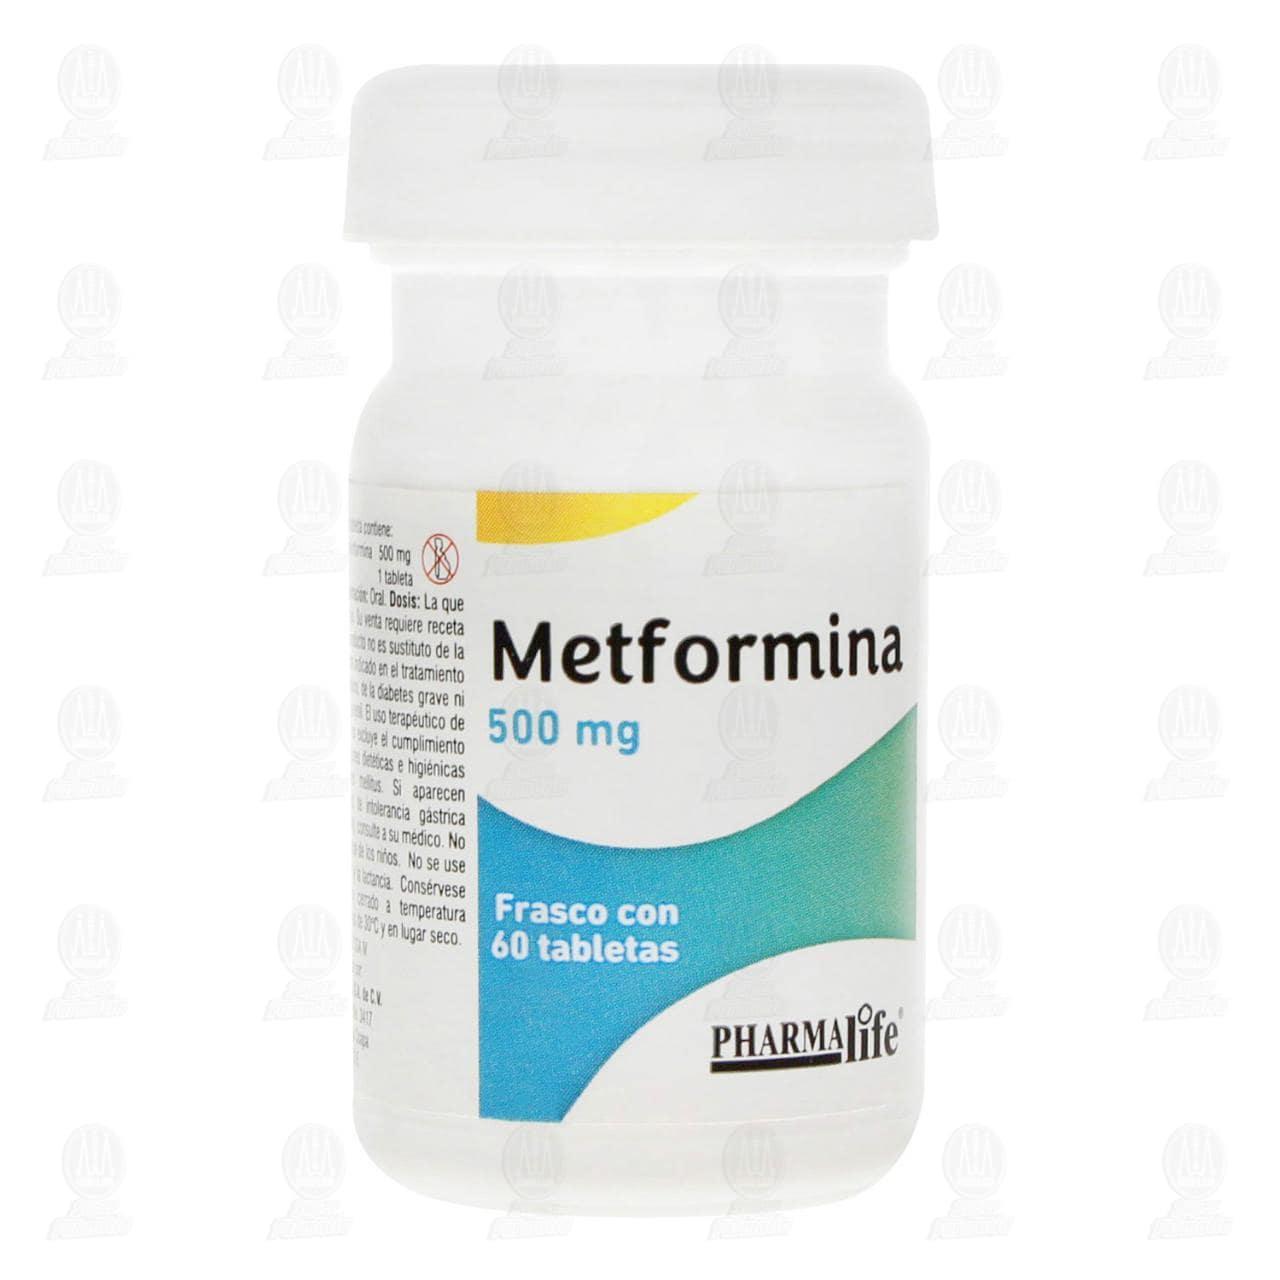 Comprar Metformina 500mg 60 Tabletas Frasco Pharmalife en Farmacias Guadalajara